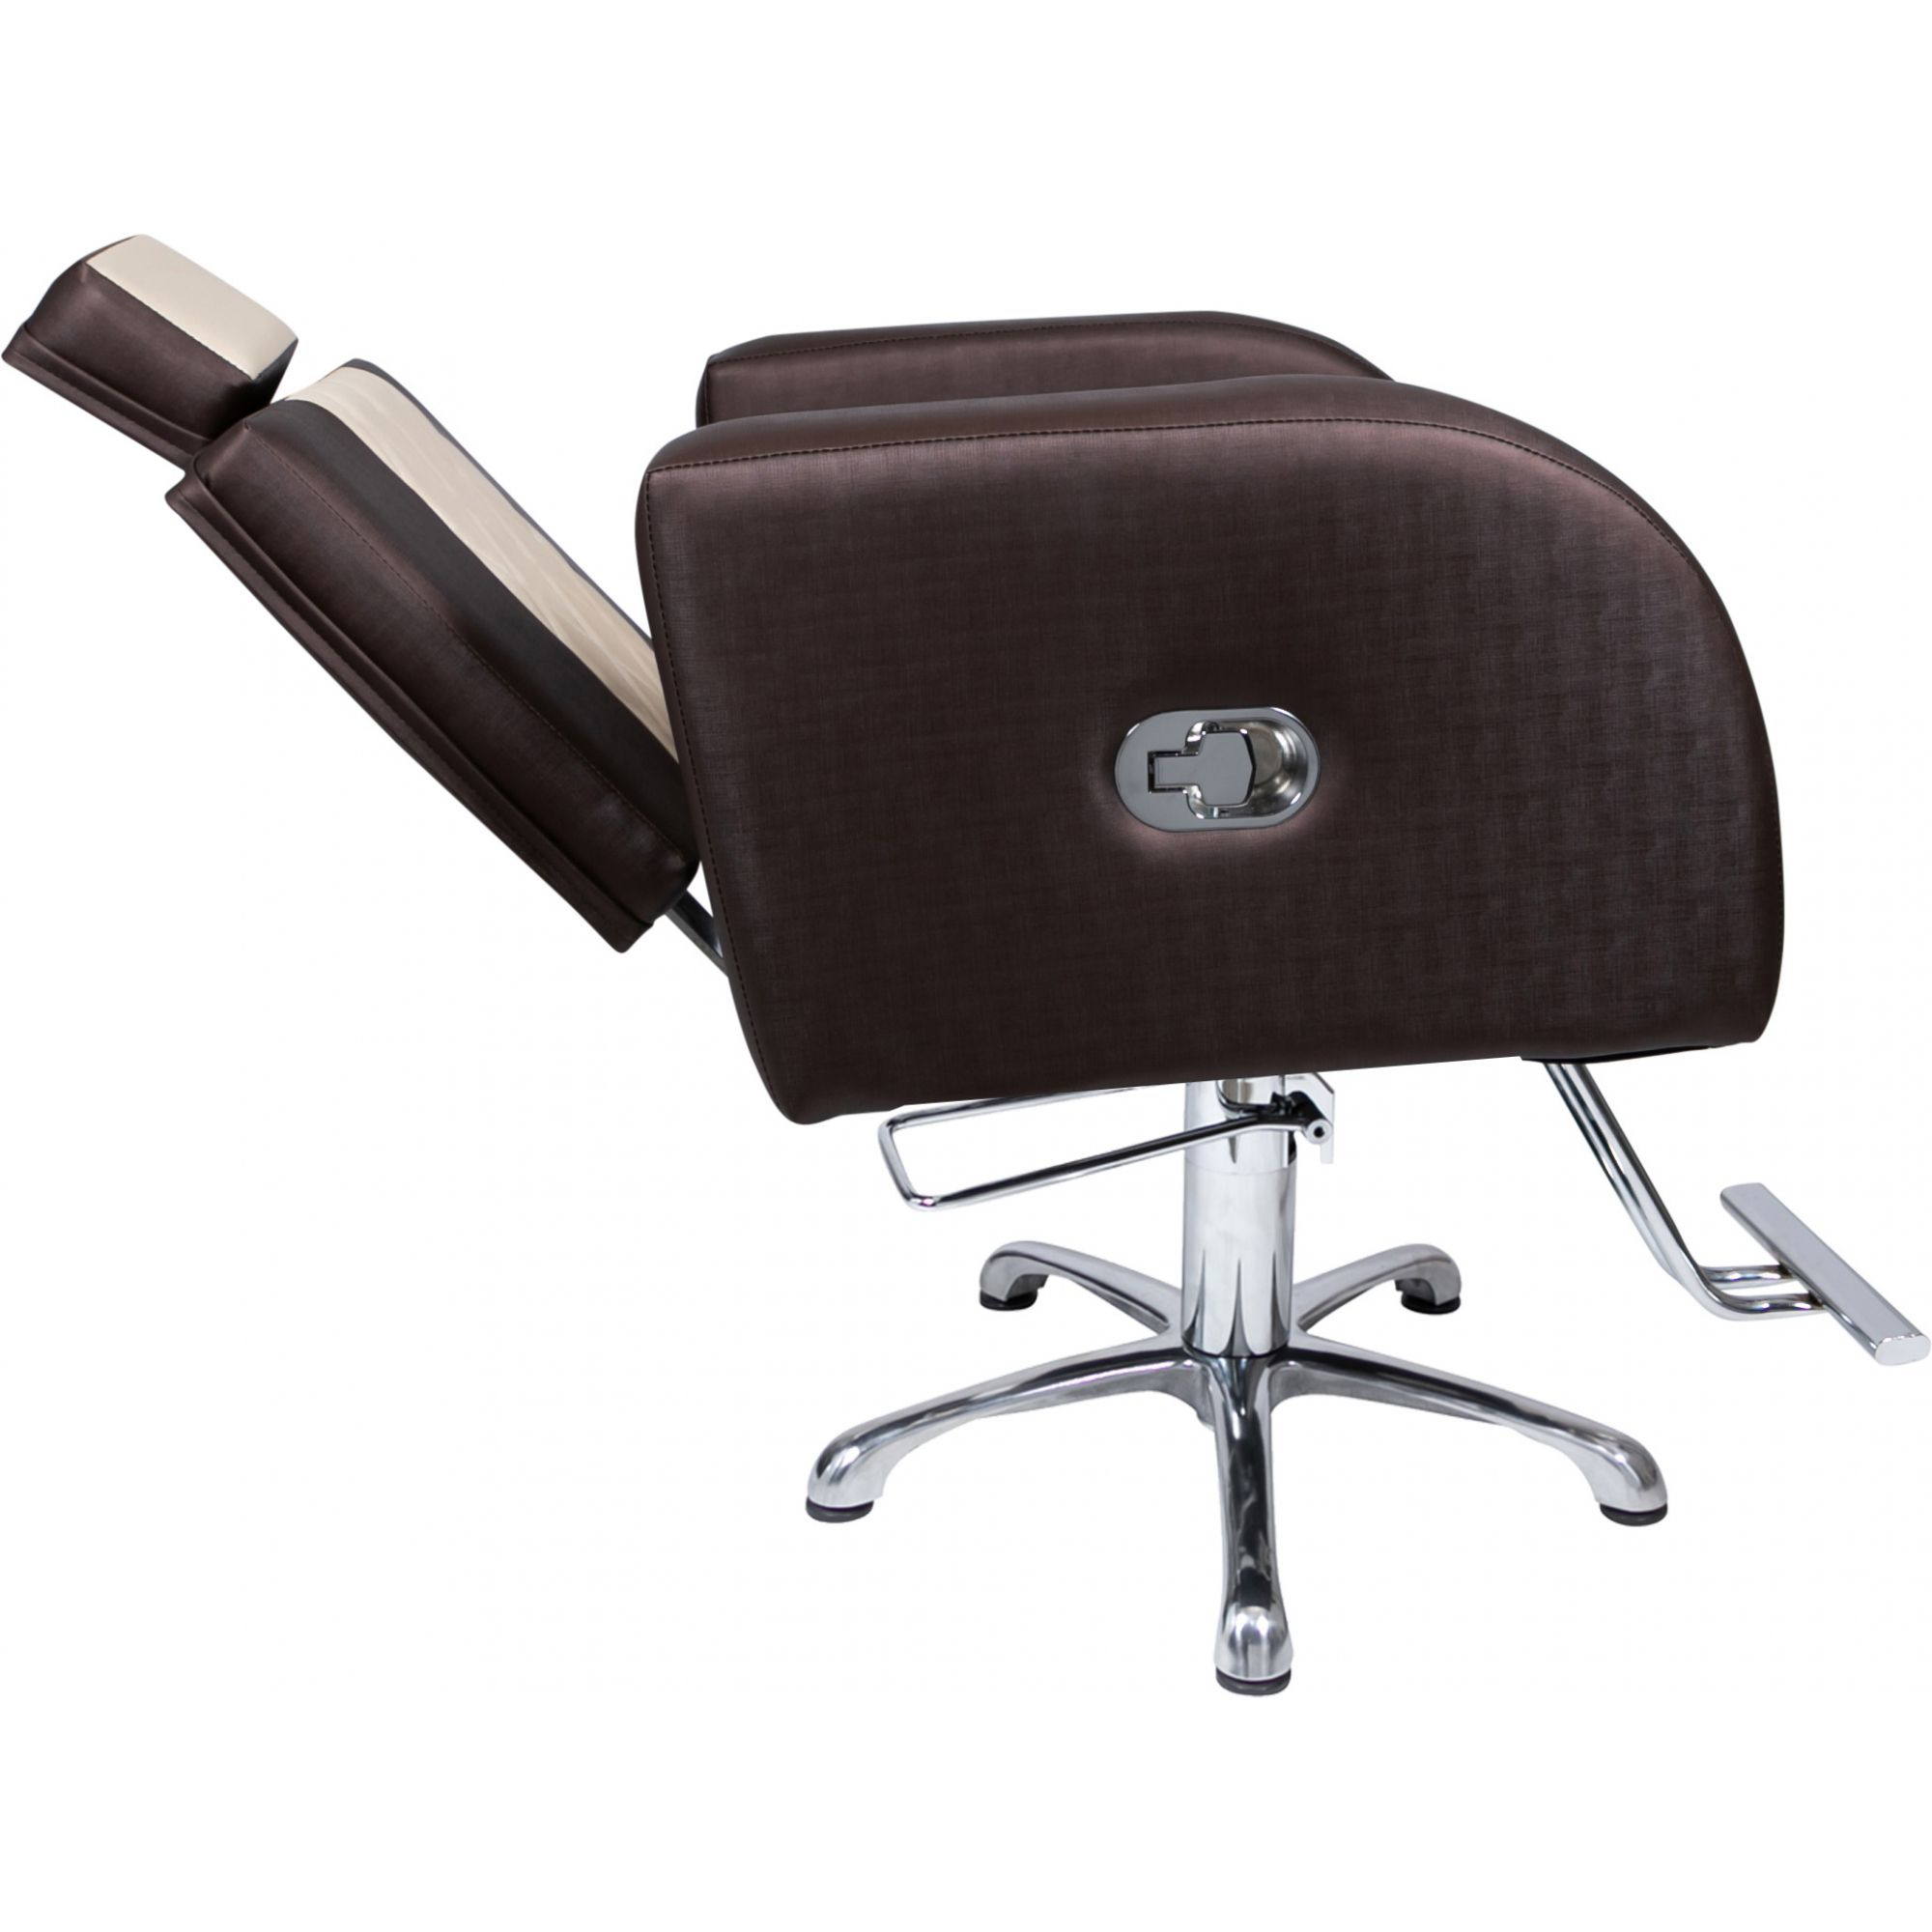 Poltrona Cadeira Hidráulica Stilo Reclínavel Bege/Marrom